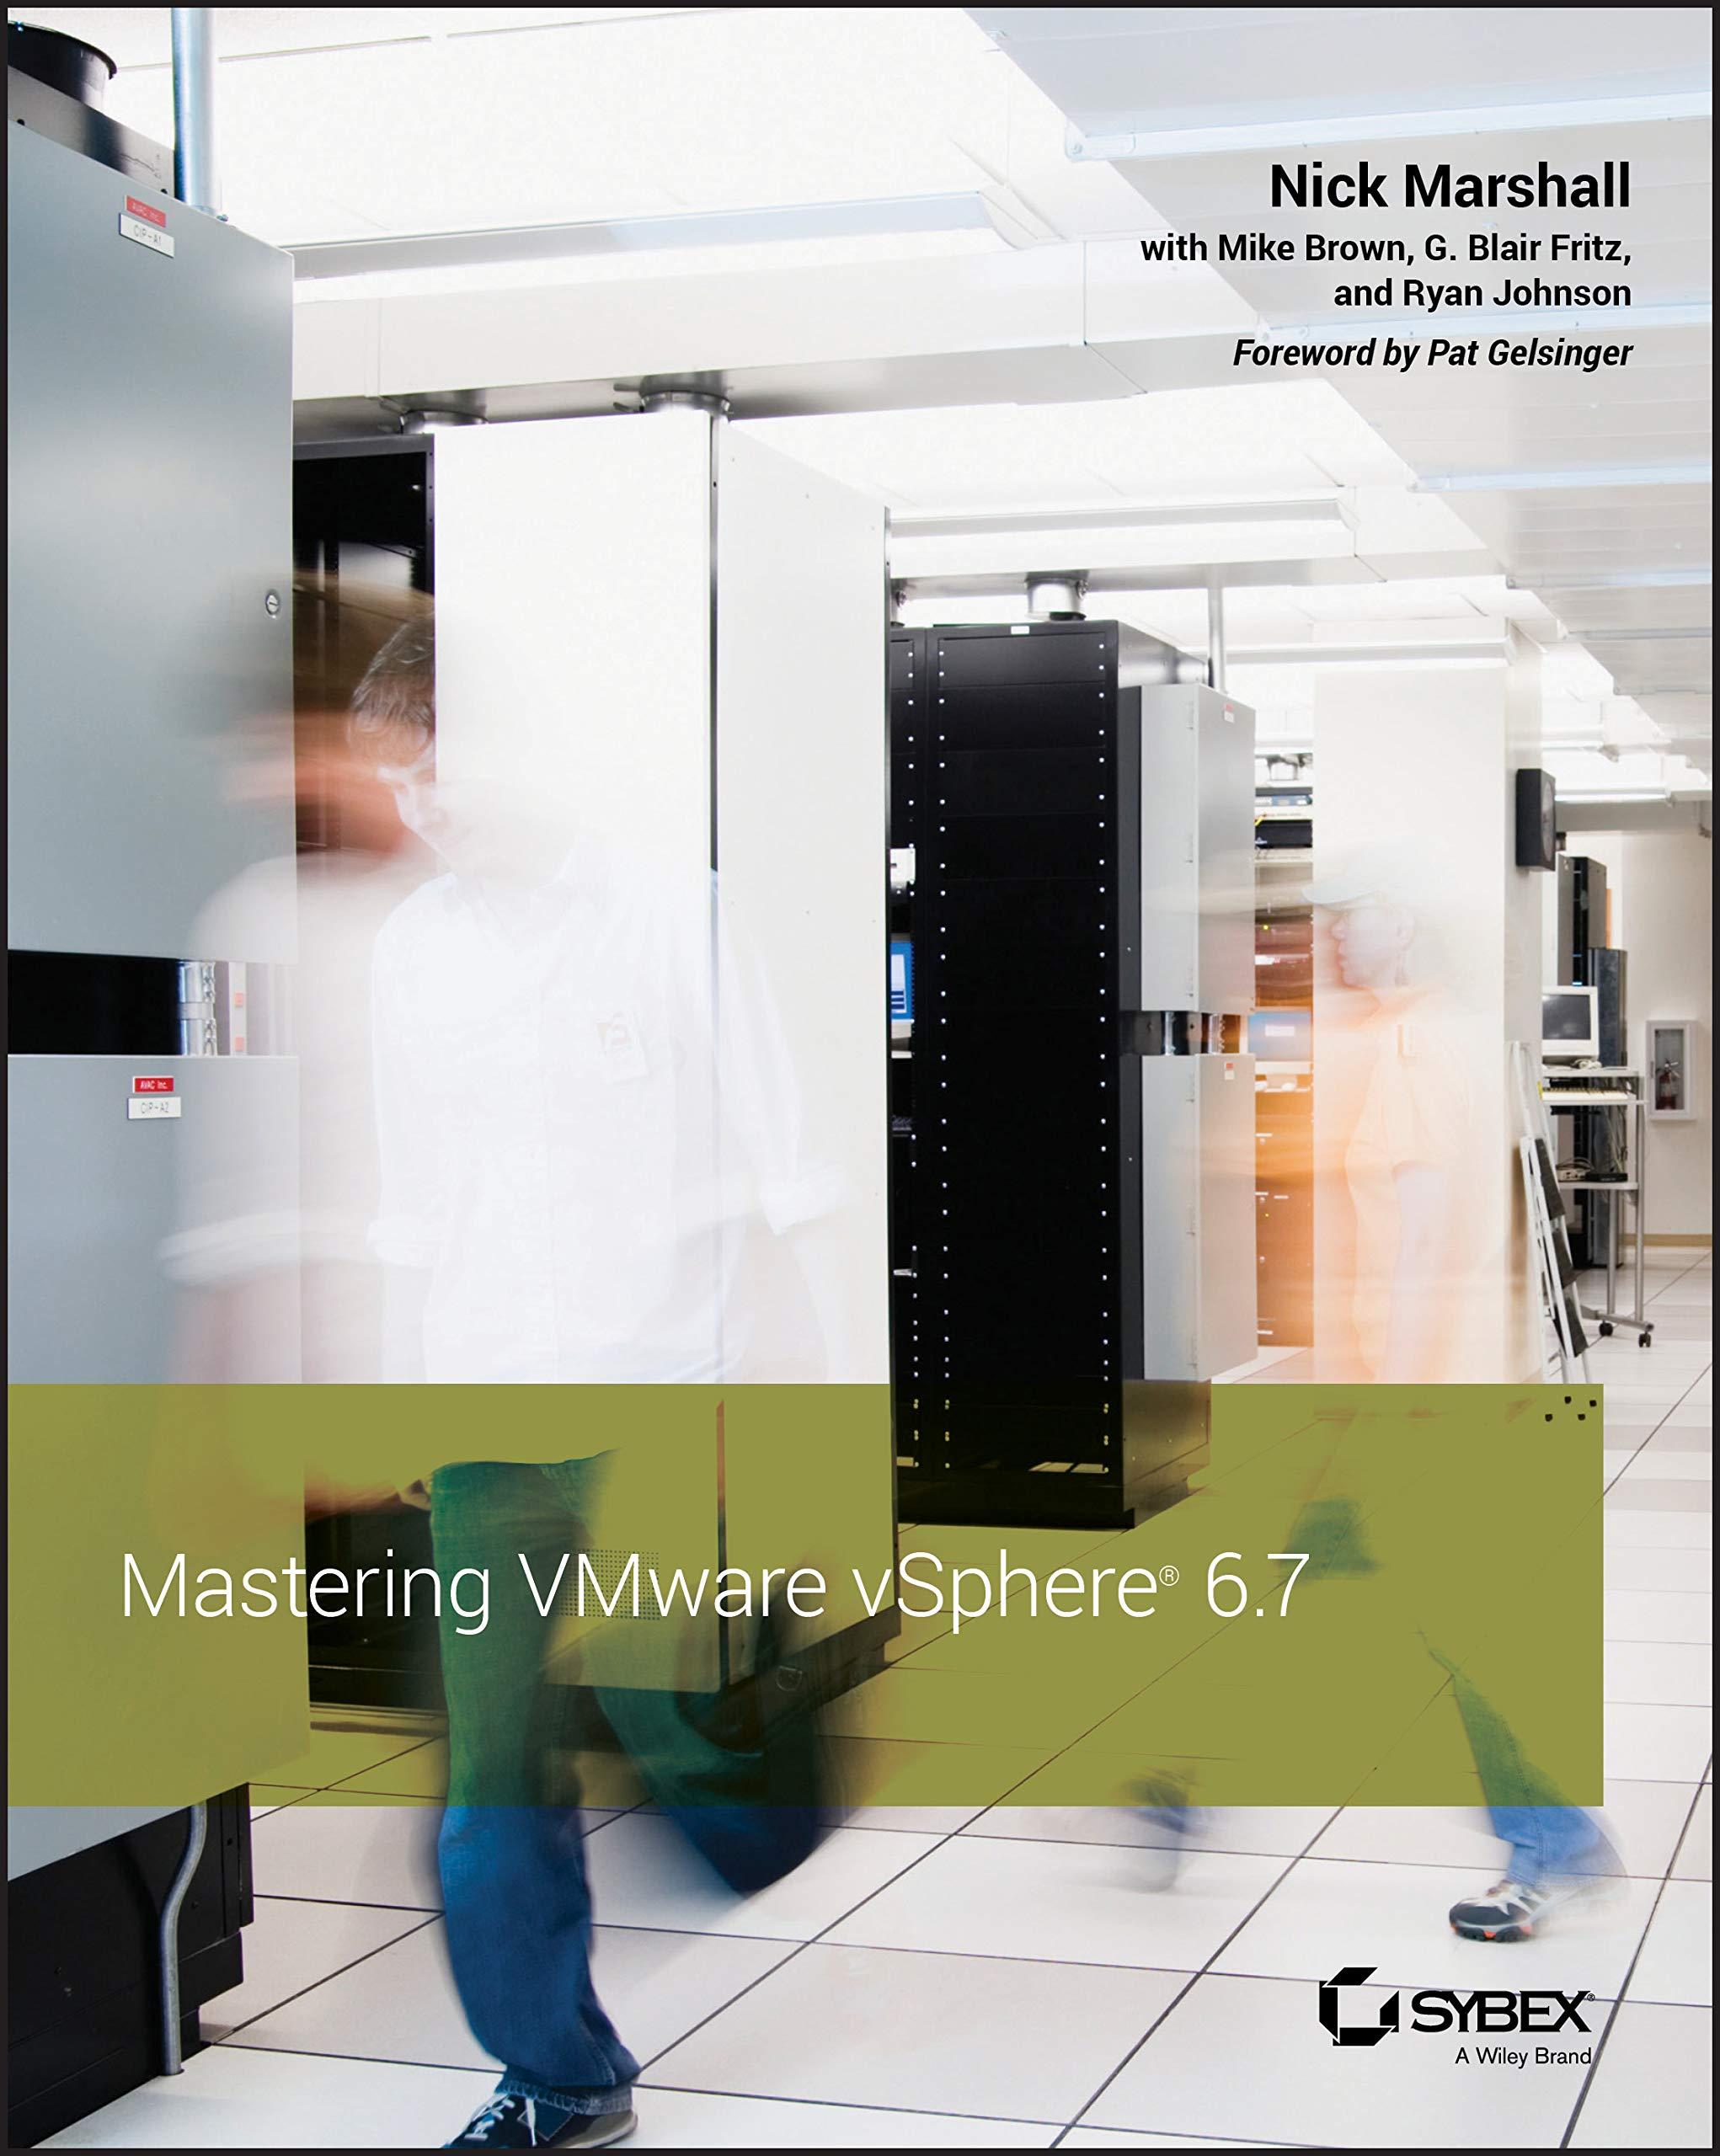 Marshall, N: Mastering VMware vSphere 6.7: Amazon.es: Marshall, Nick: Libros en idiomas extranjeros